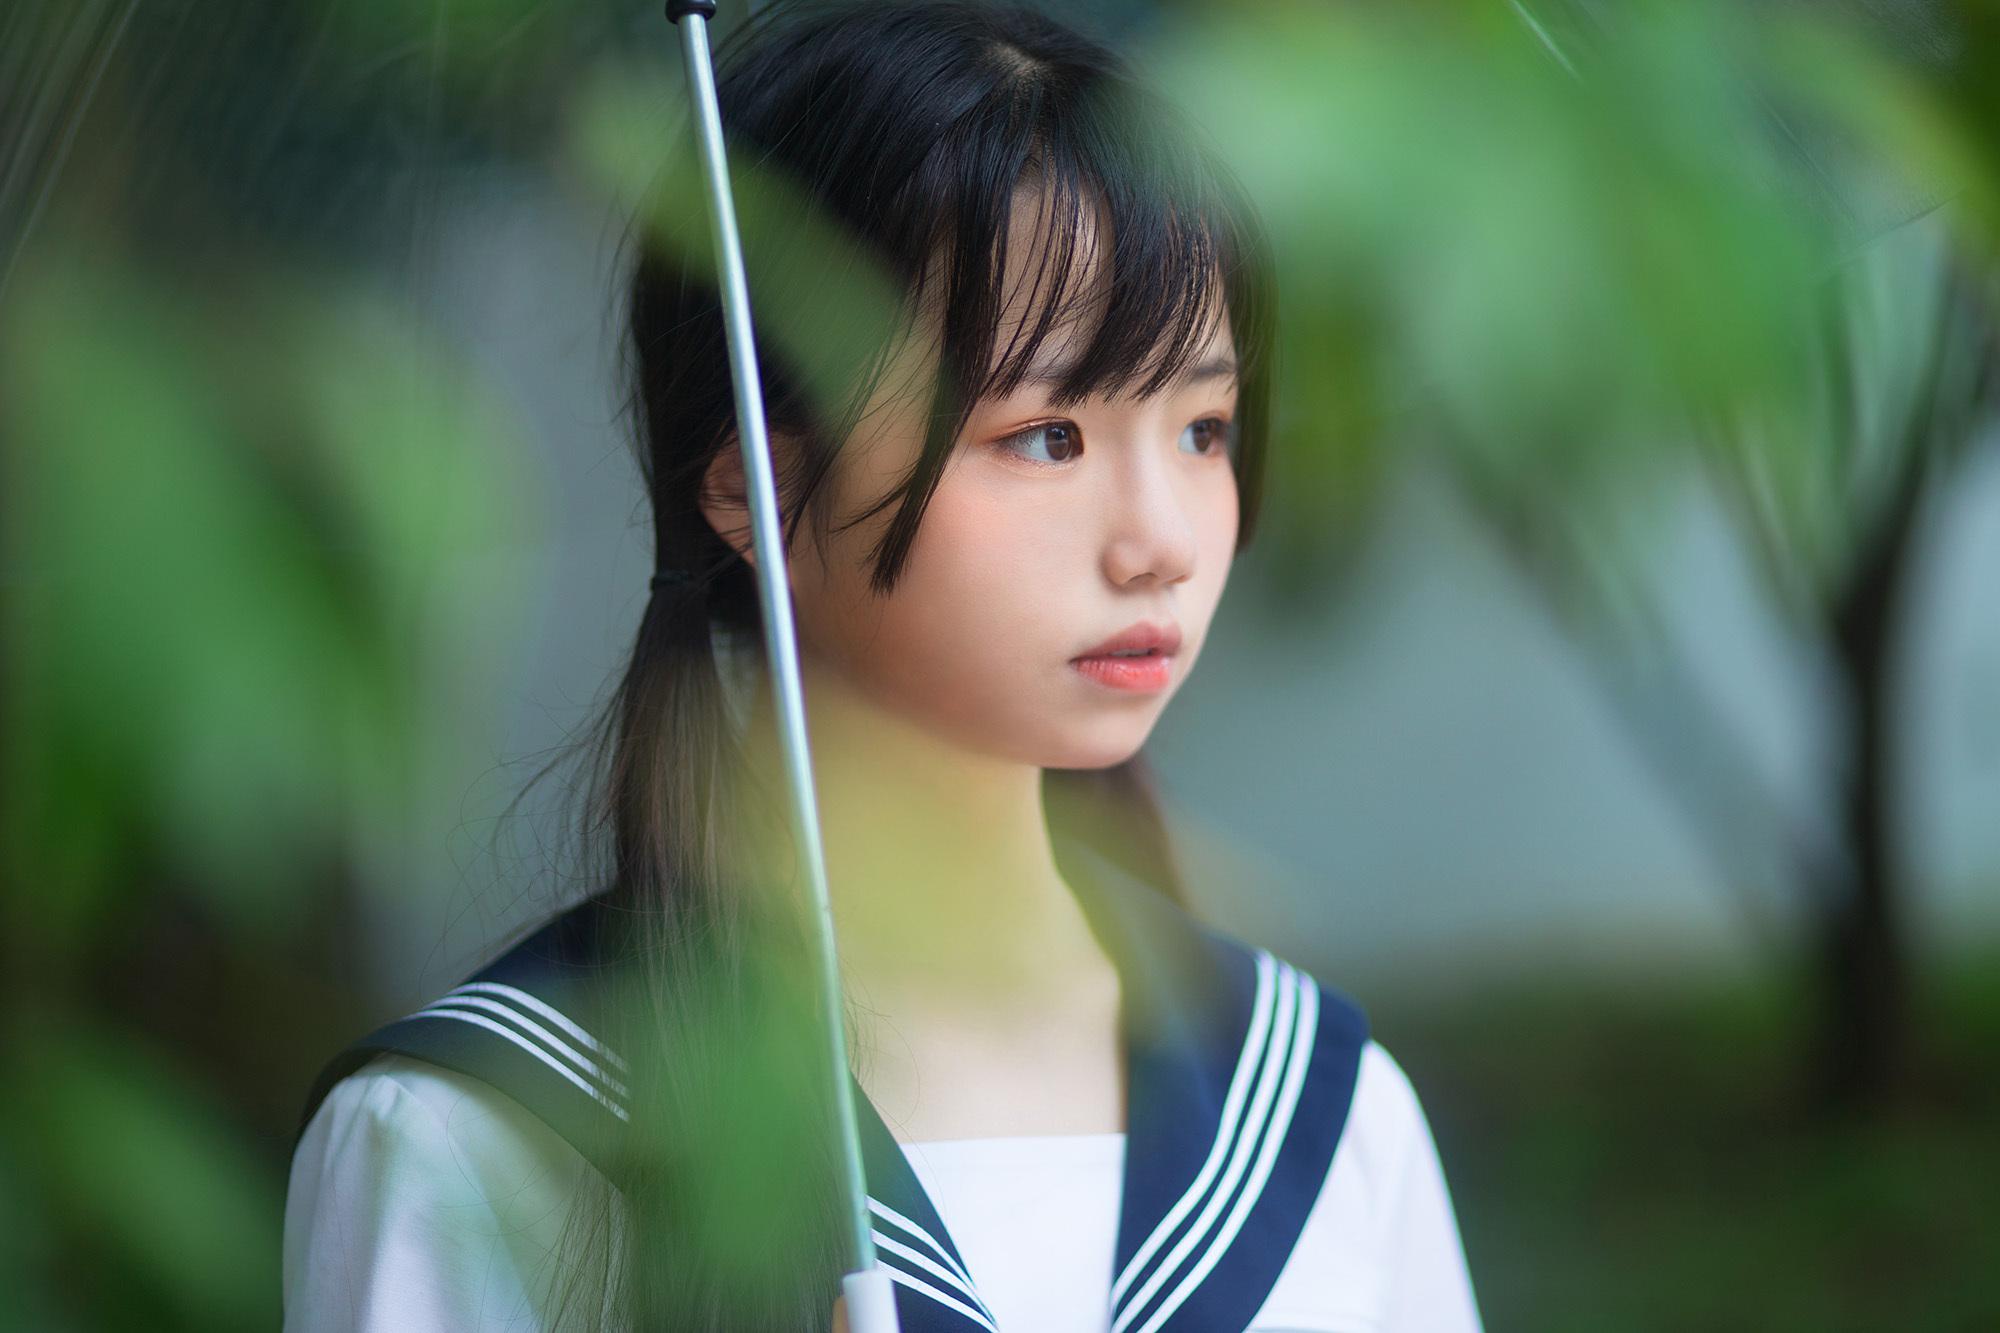 MGDV-018大奶美女皮卡丘内衣秀超好身材